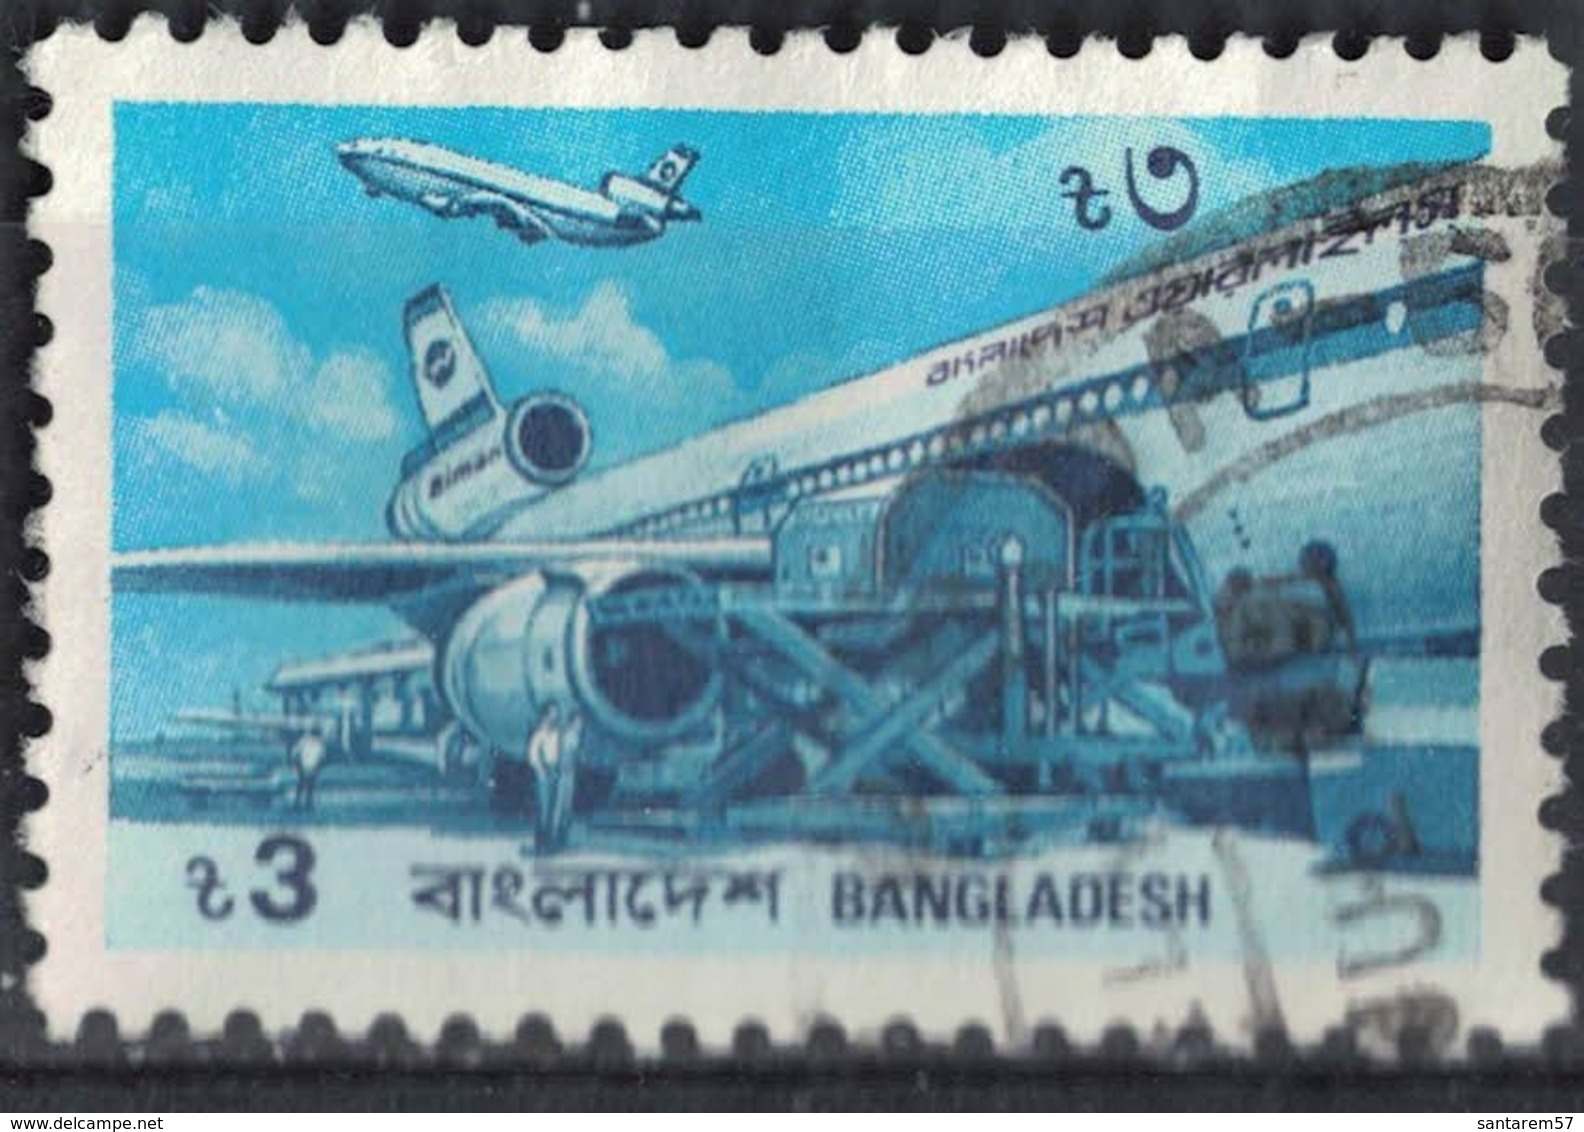 Bangladesh 1989 Oblitéré Used Loading Aircraft Chargement Avion McDonnell Douglas - Bangladesh